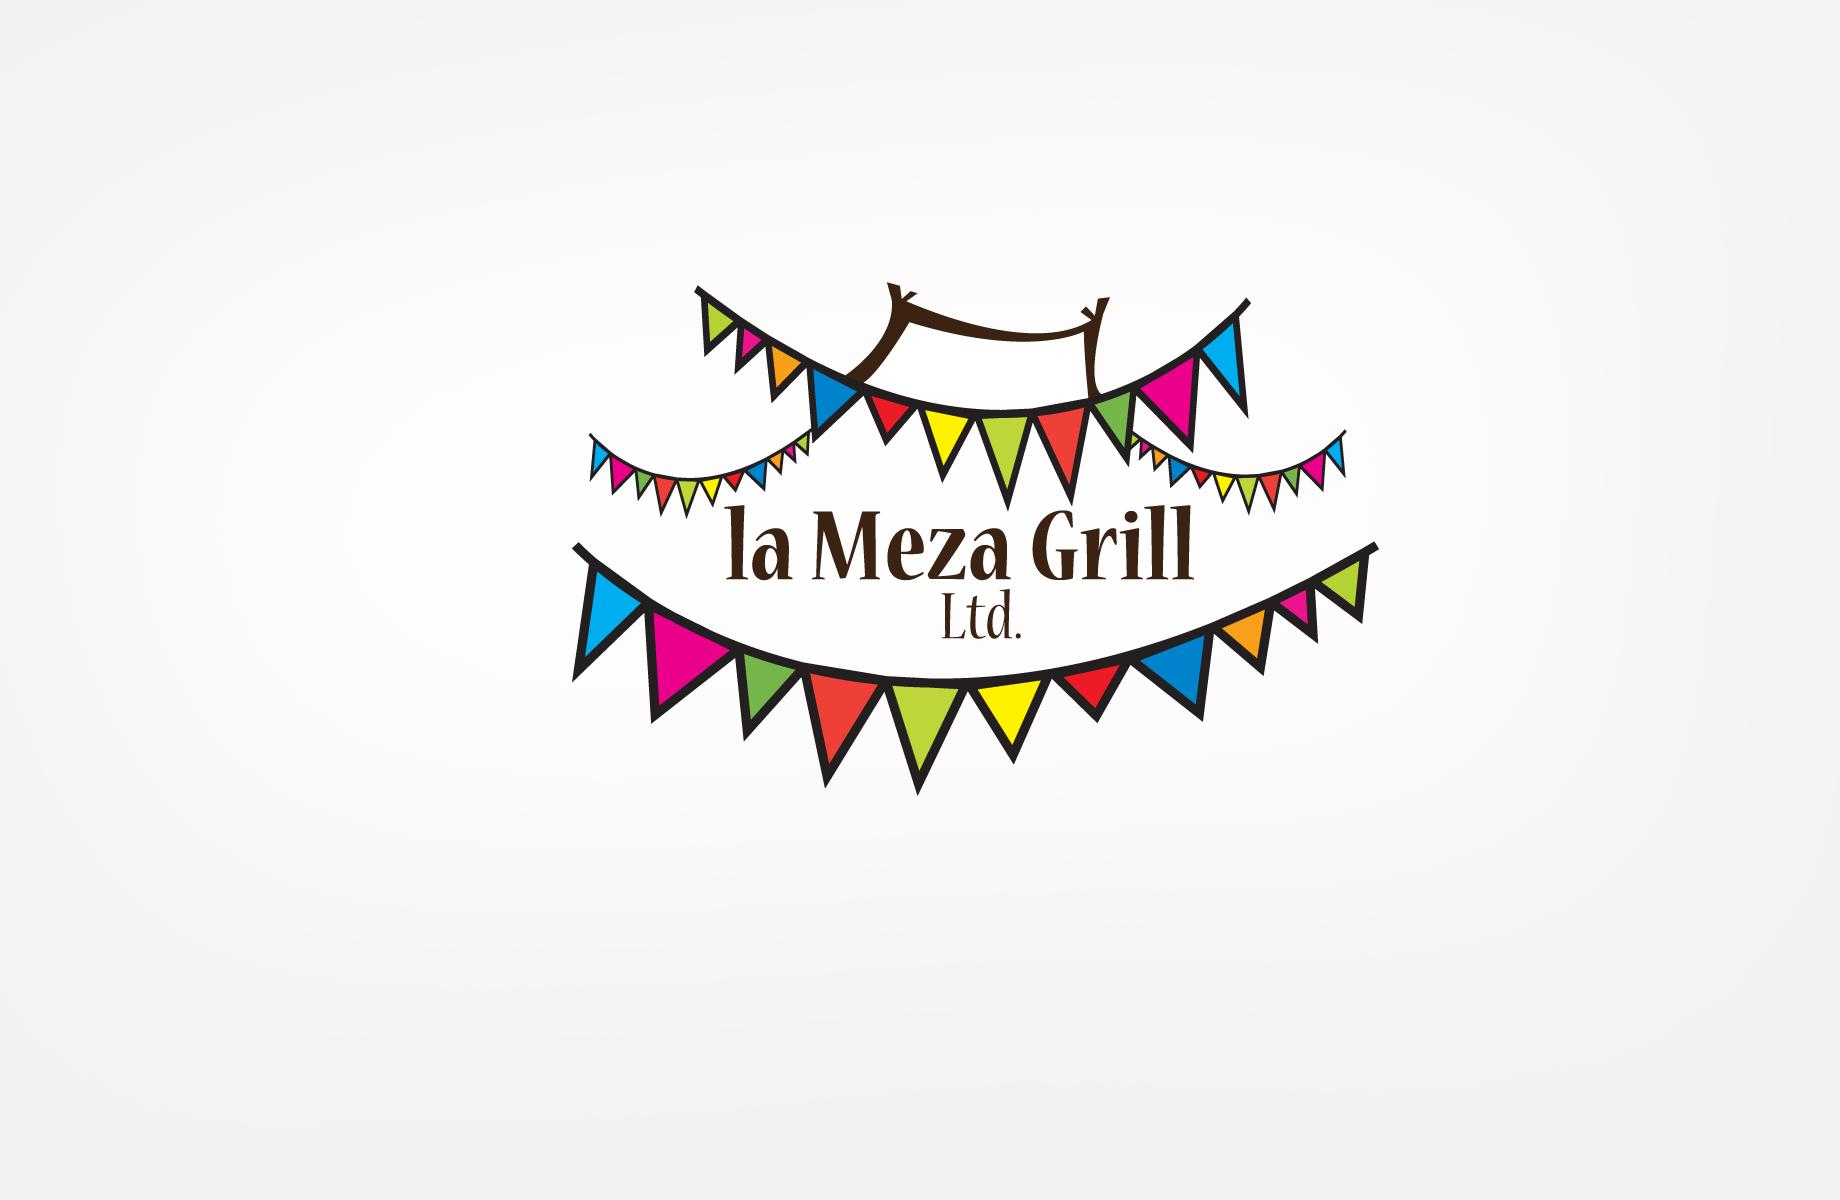 Logo Design by Jan Chua - Entry No. 36 in the Logo Design Contest Inspiring Logo Design for La Meza Grill Ltd..